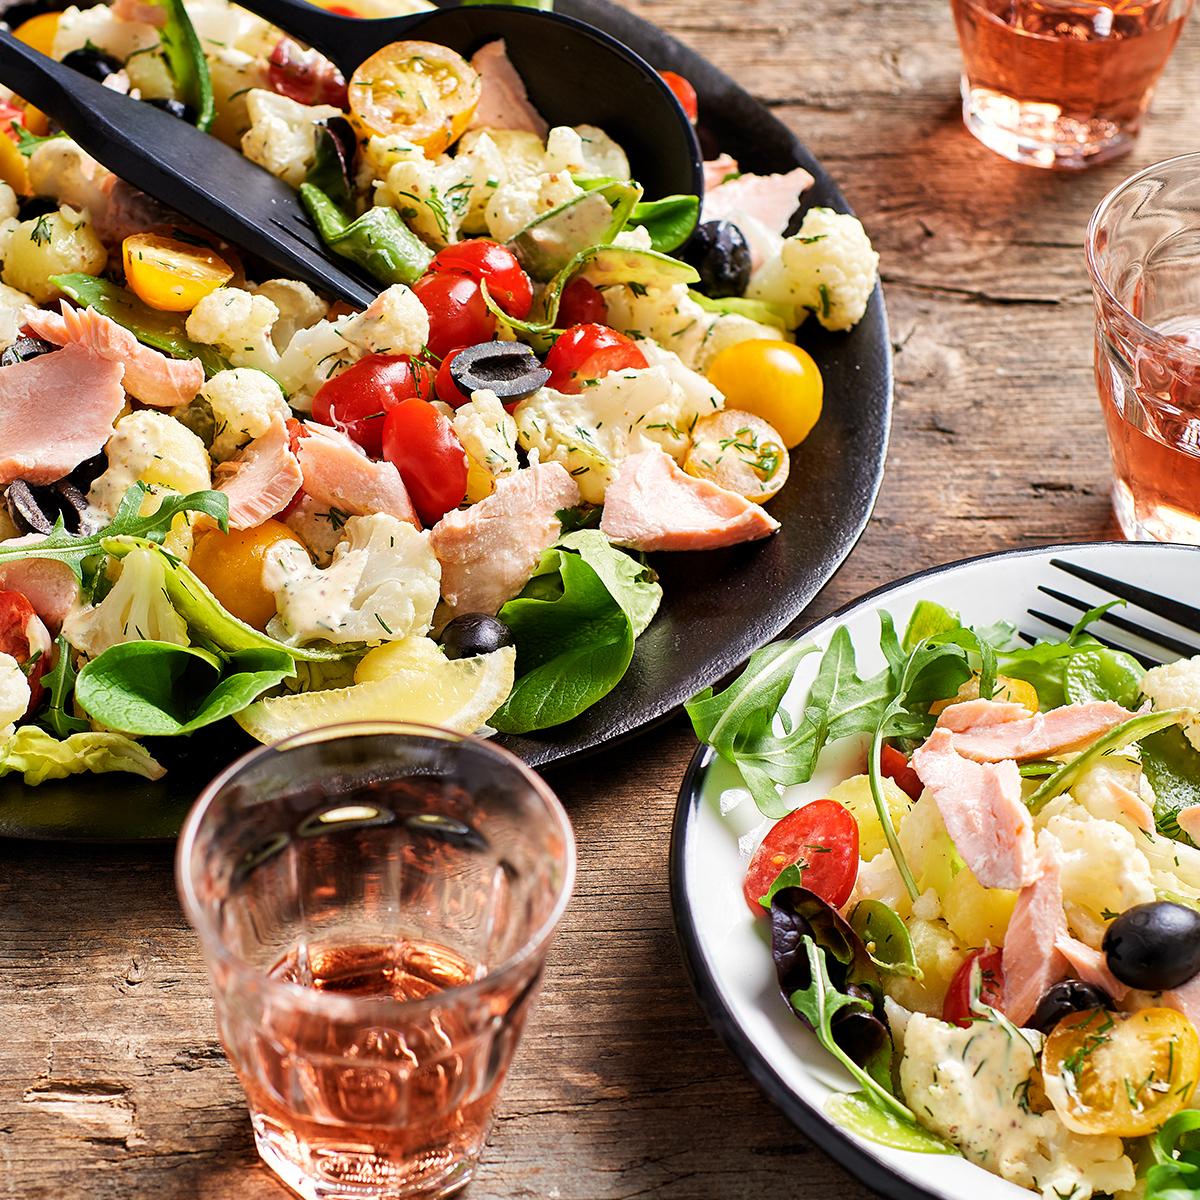 Cauliflower-potato salad with salmon